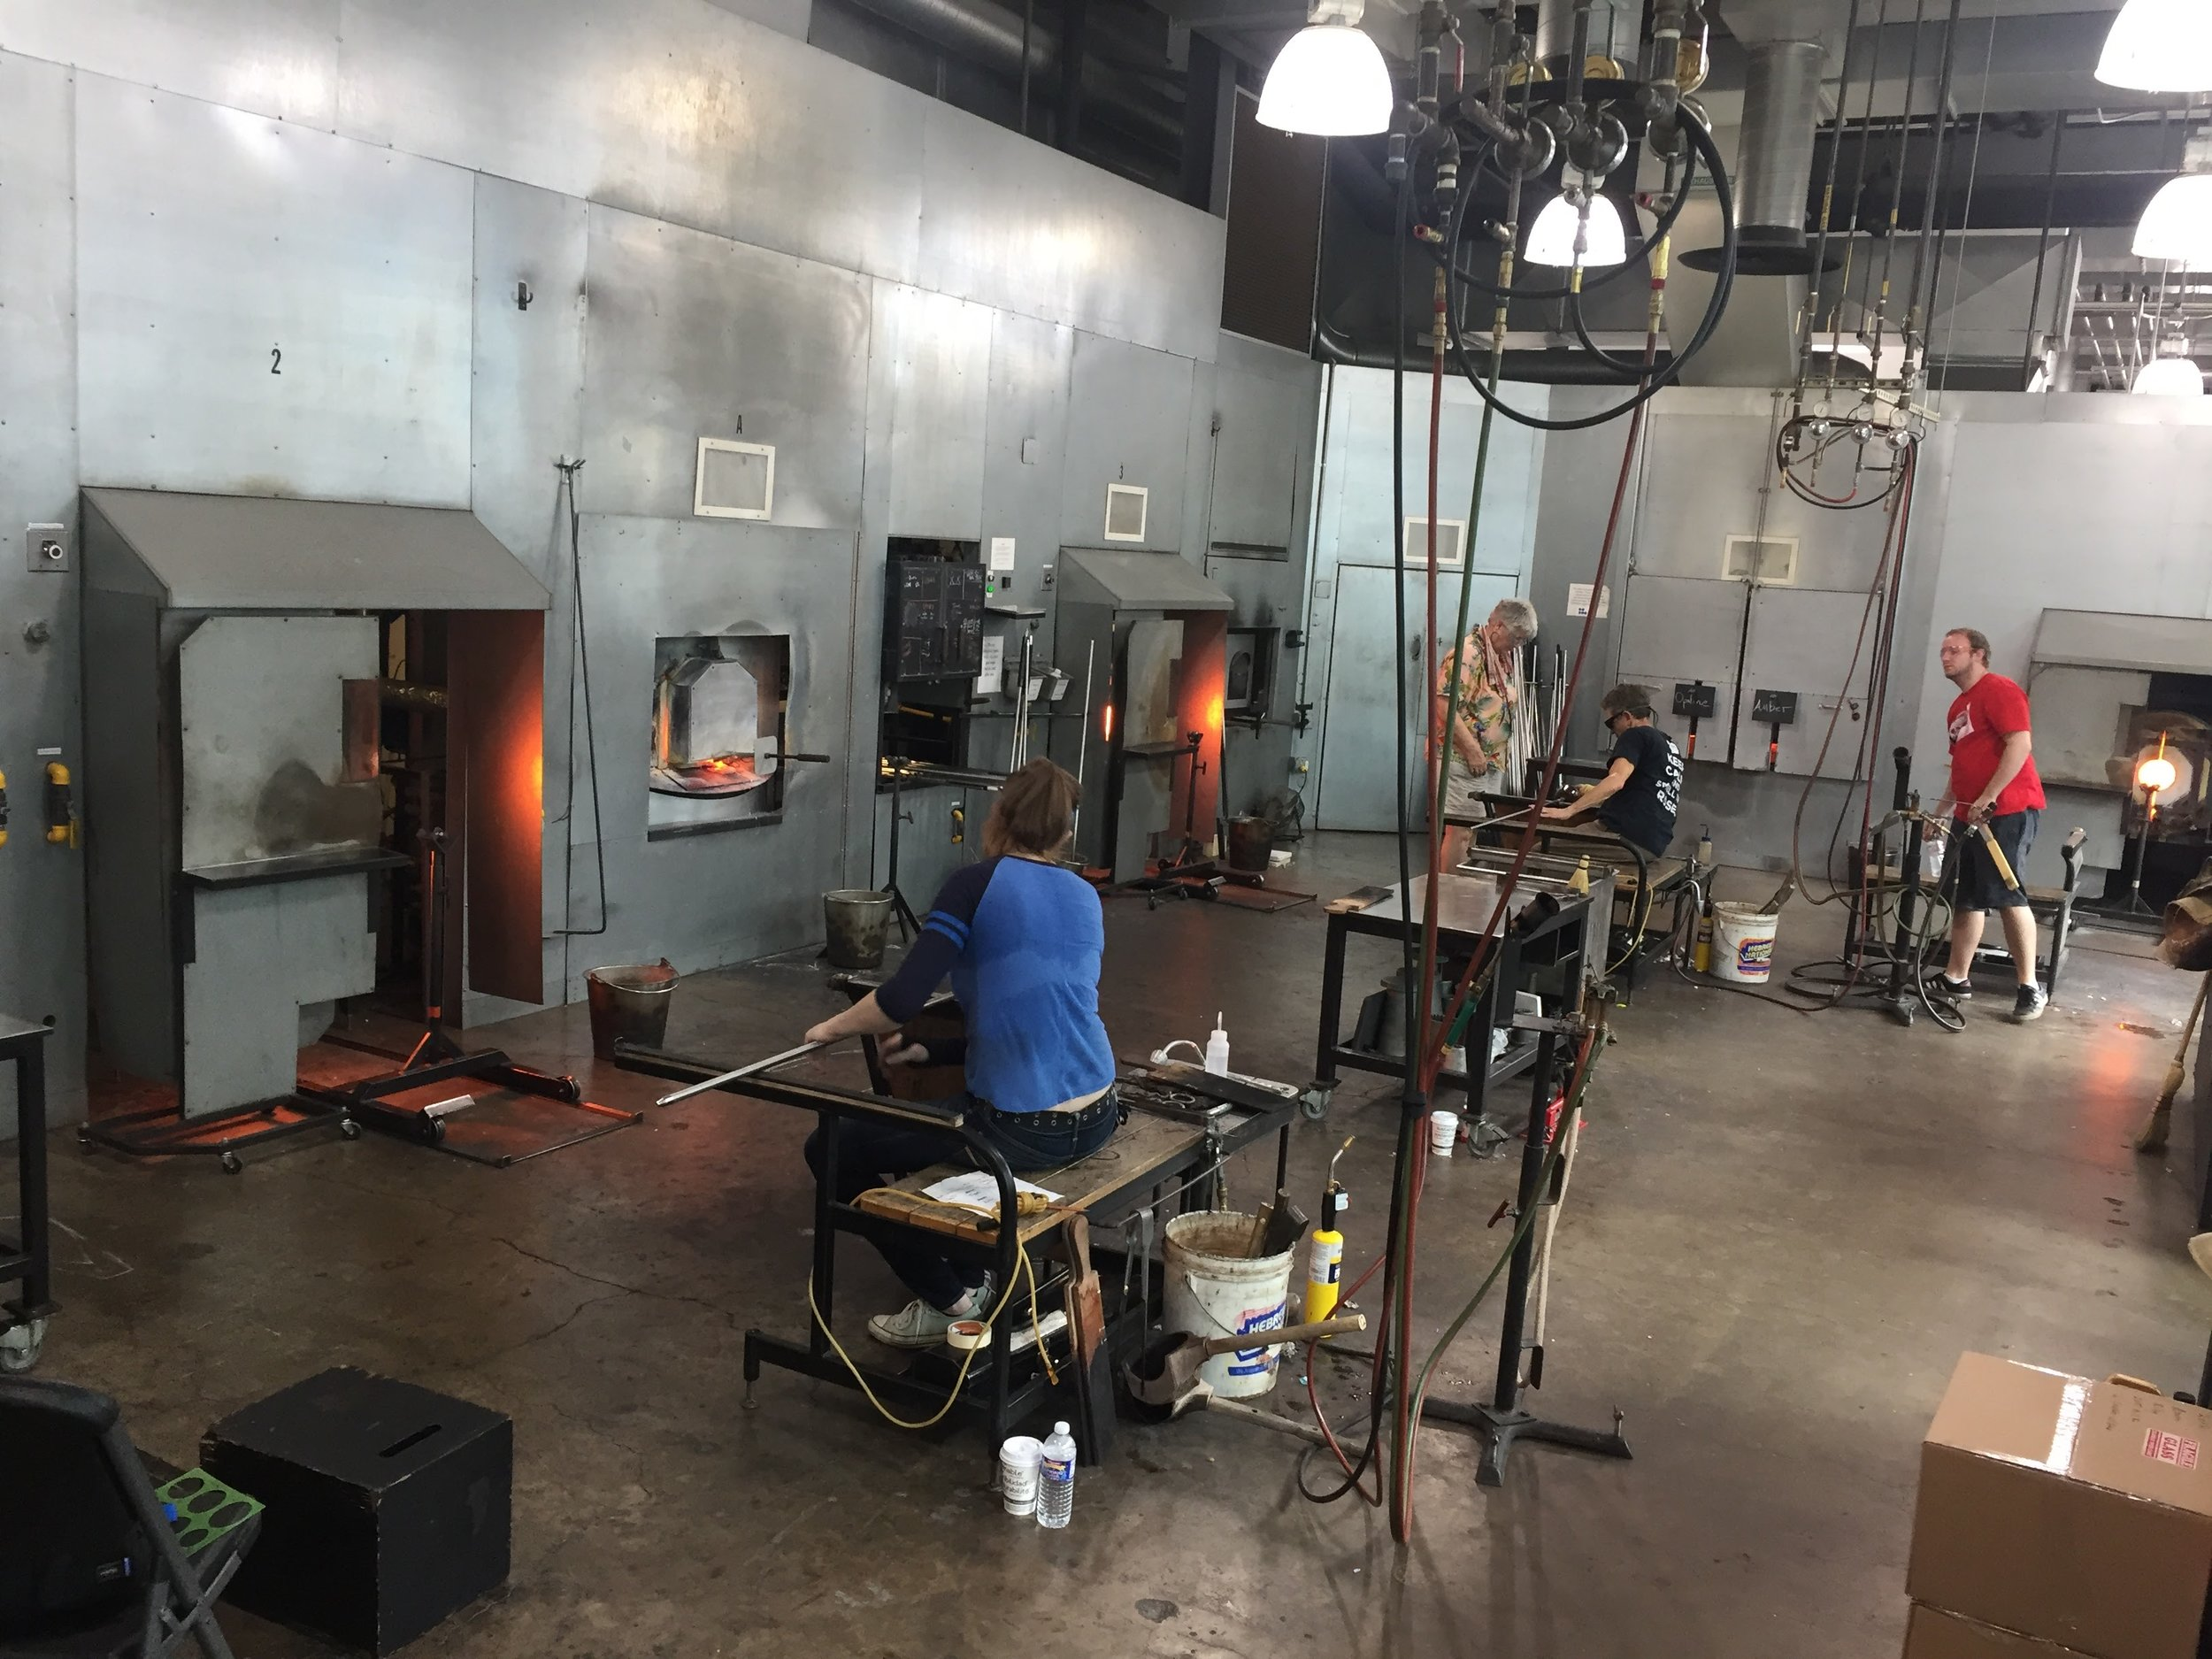 The hot studio